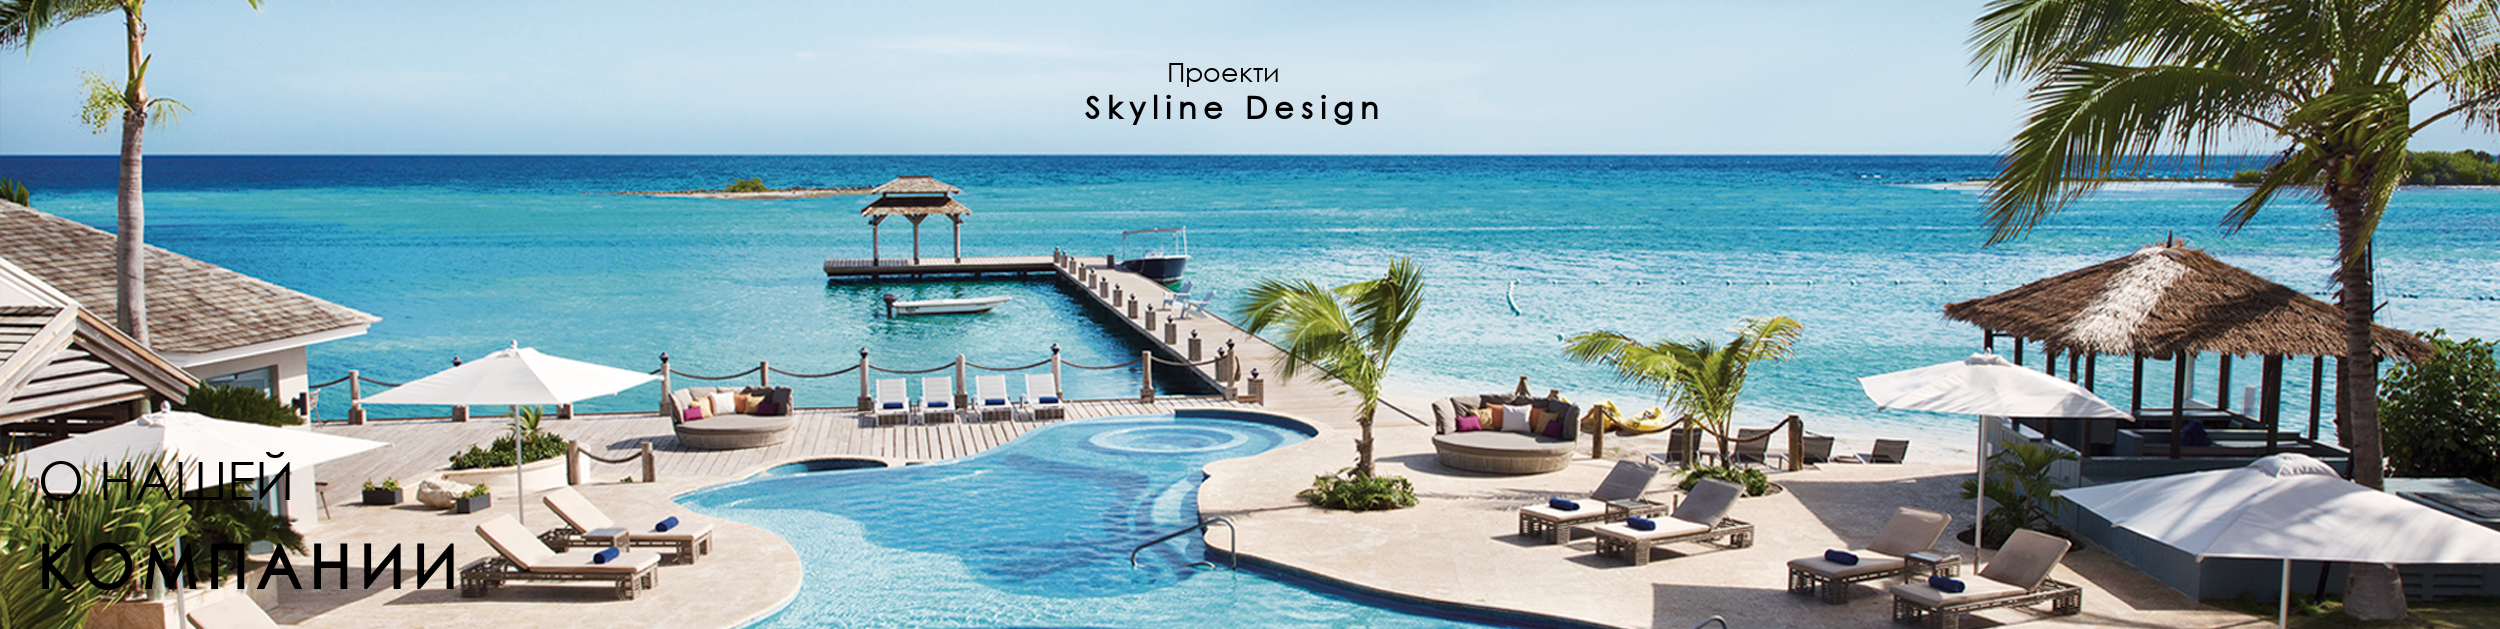 Проекти Skyline Design